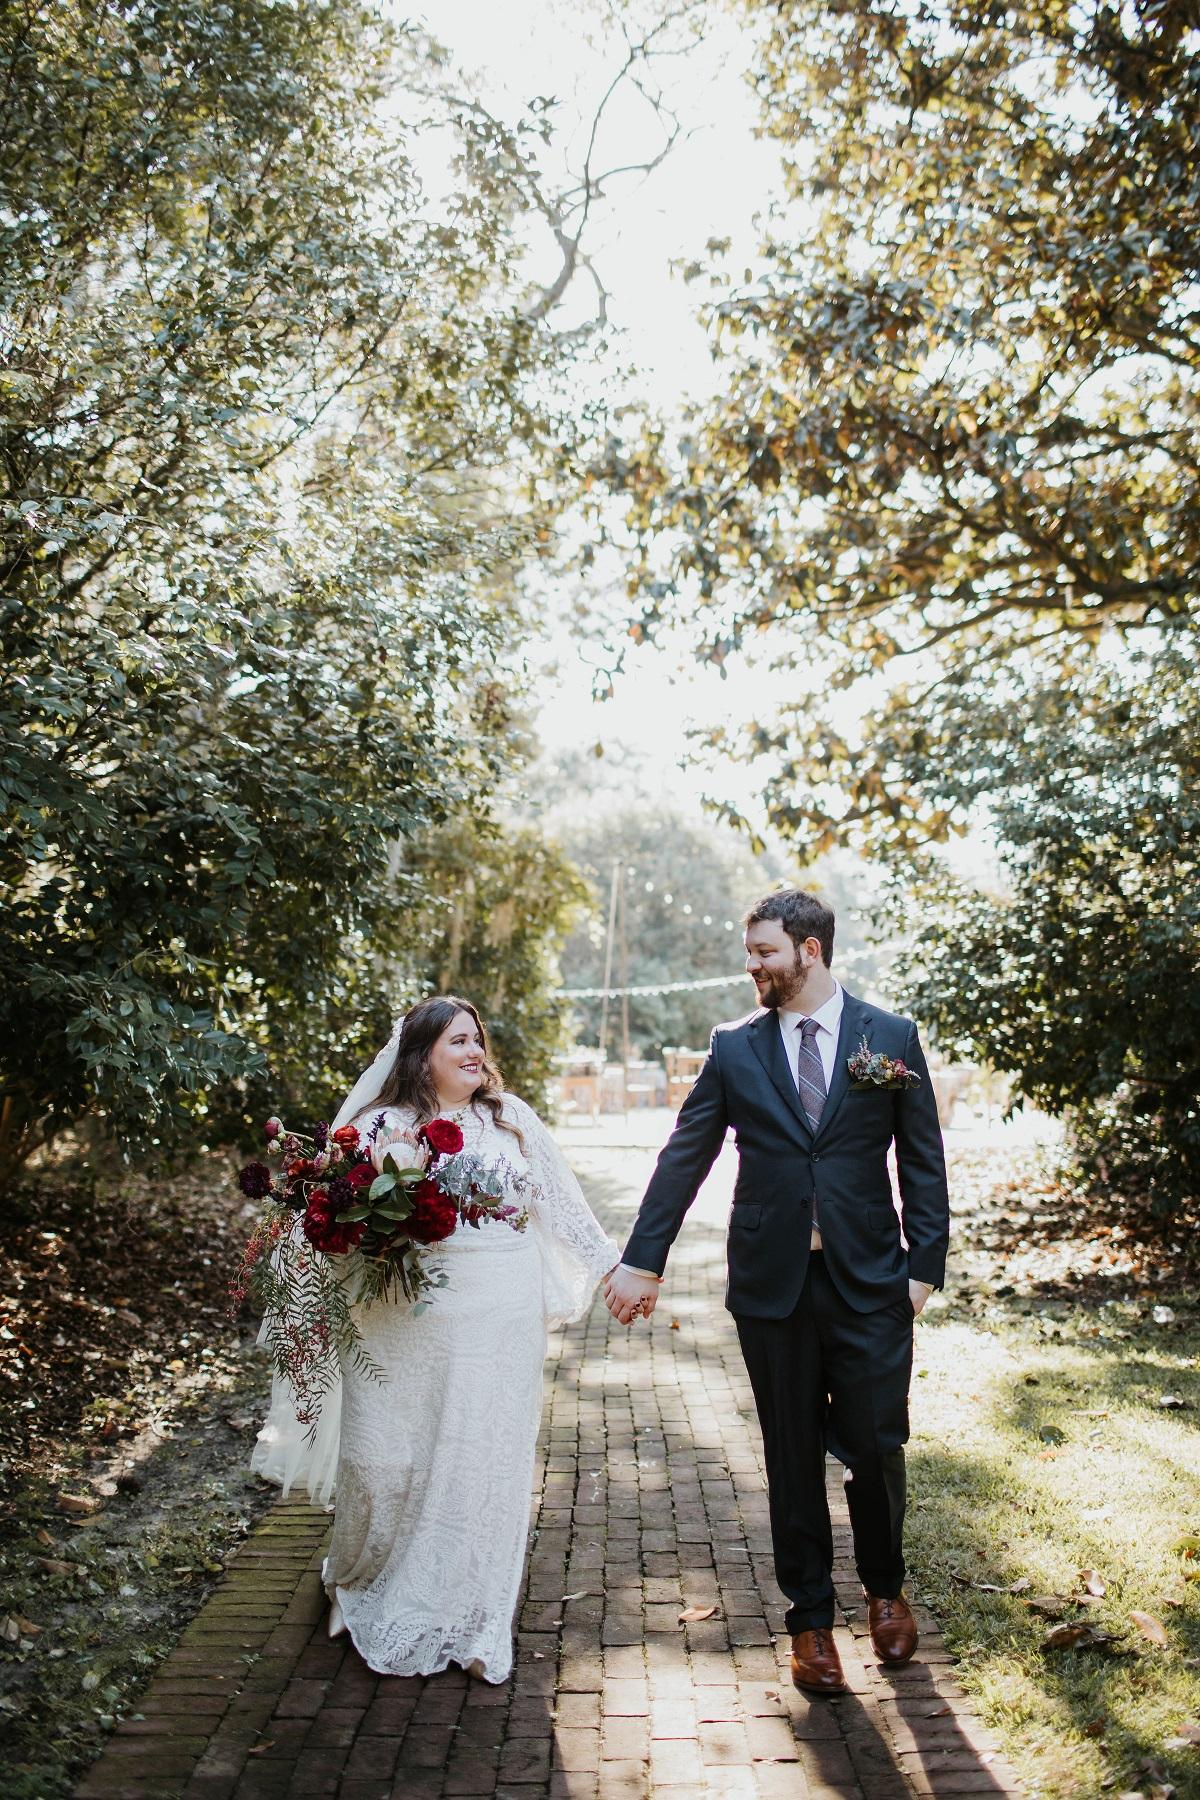 legare-waring-house-wedding-100.jpg